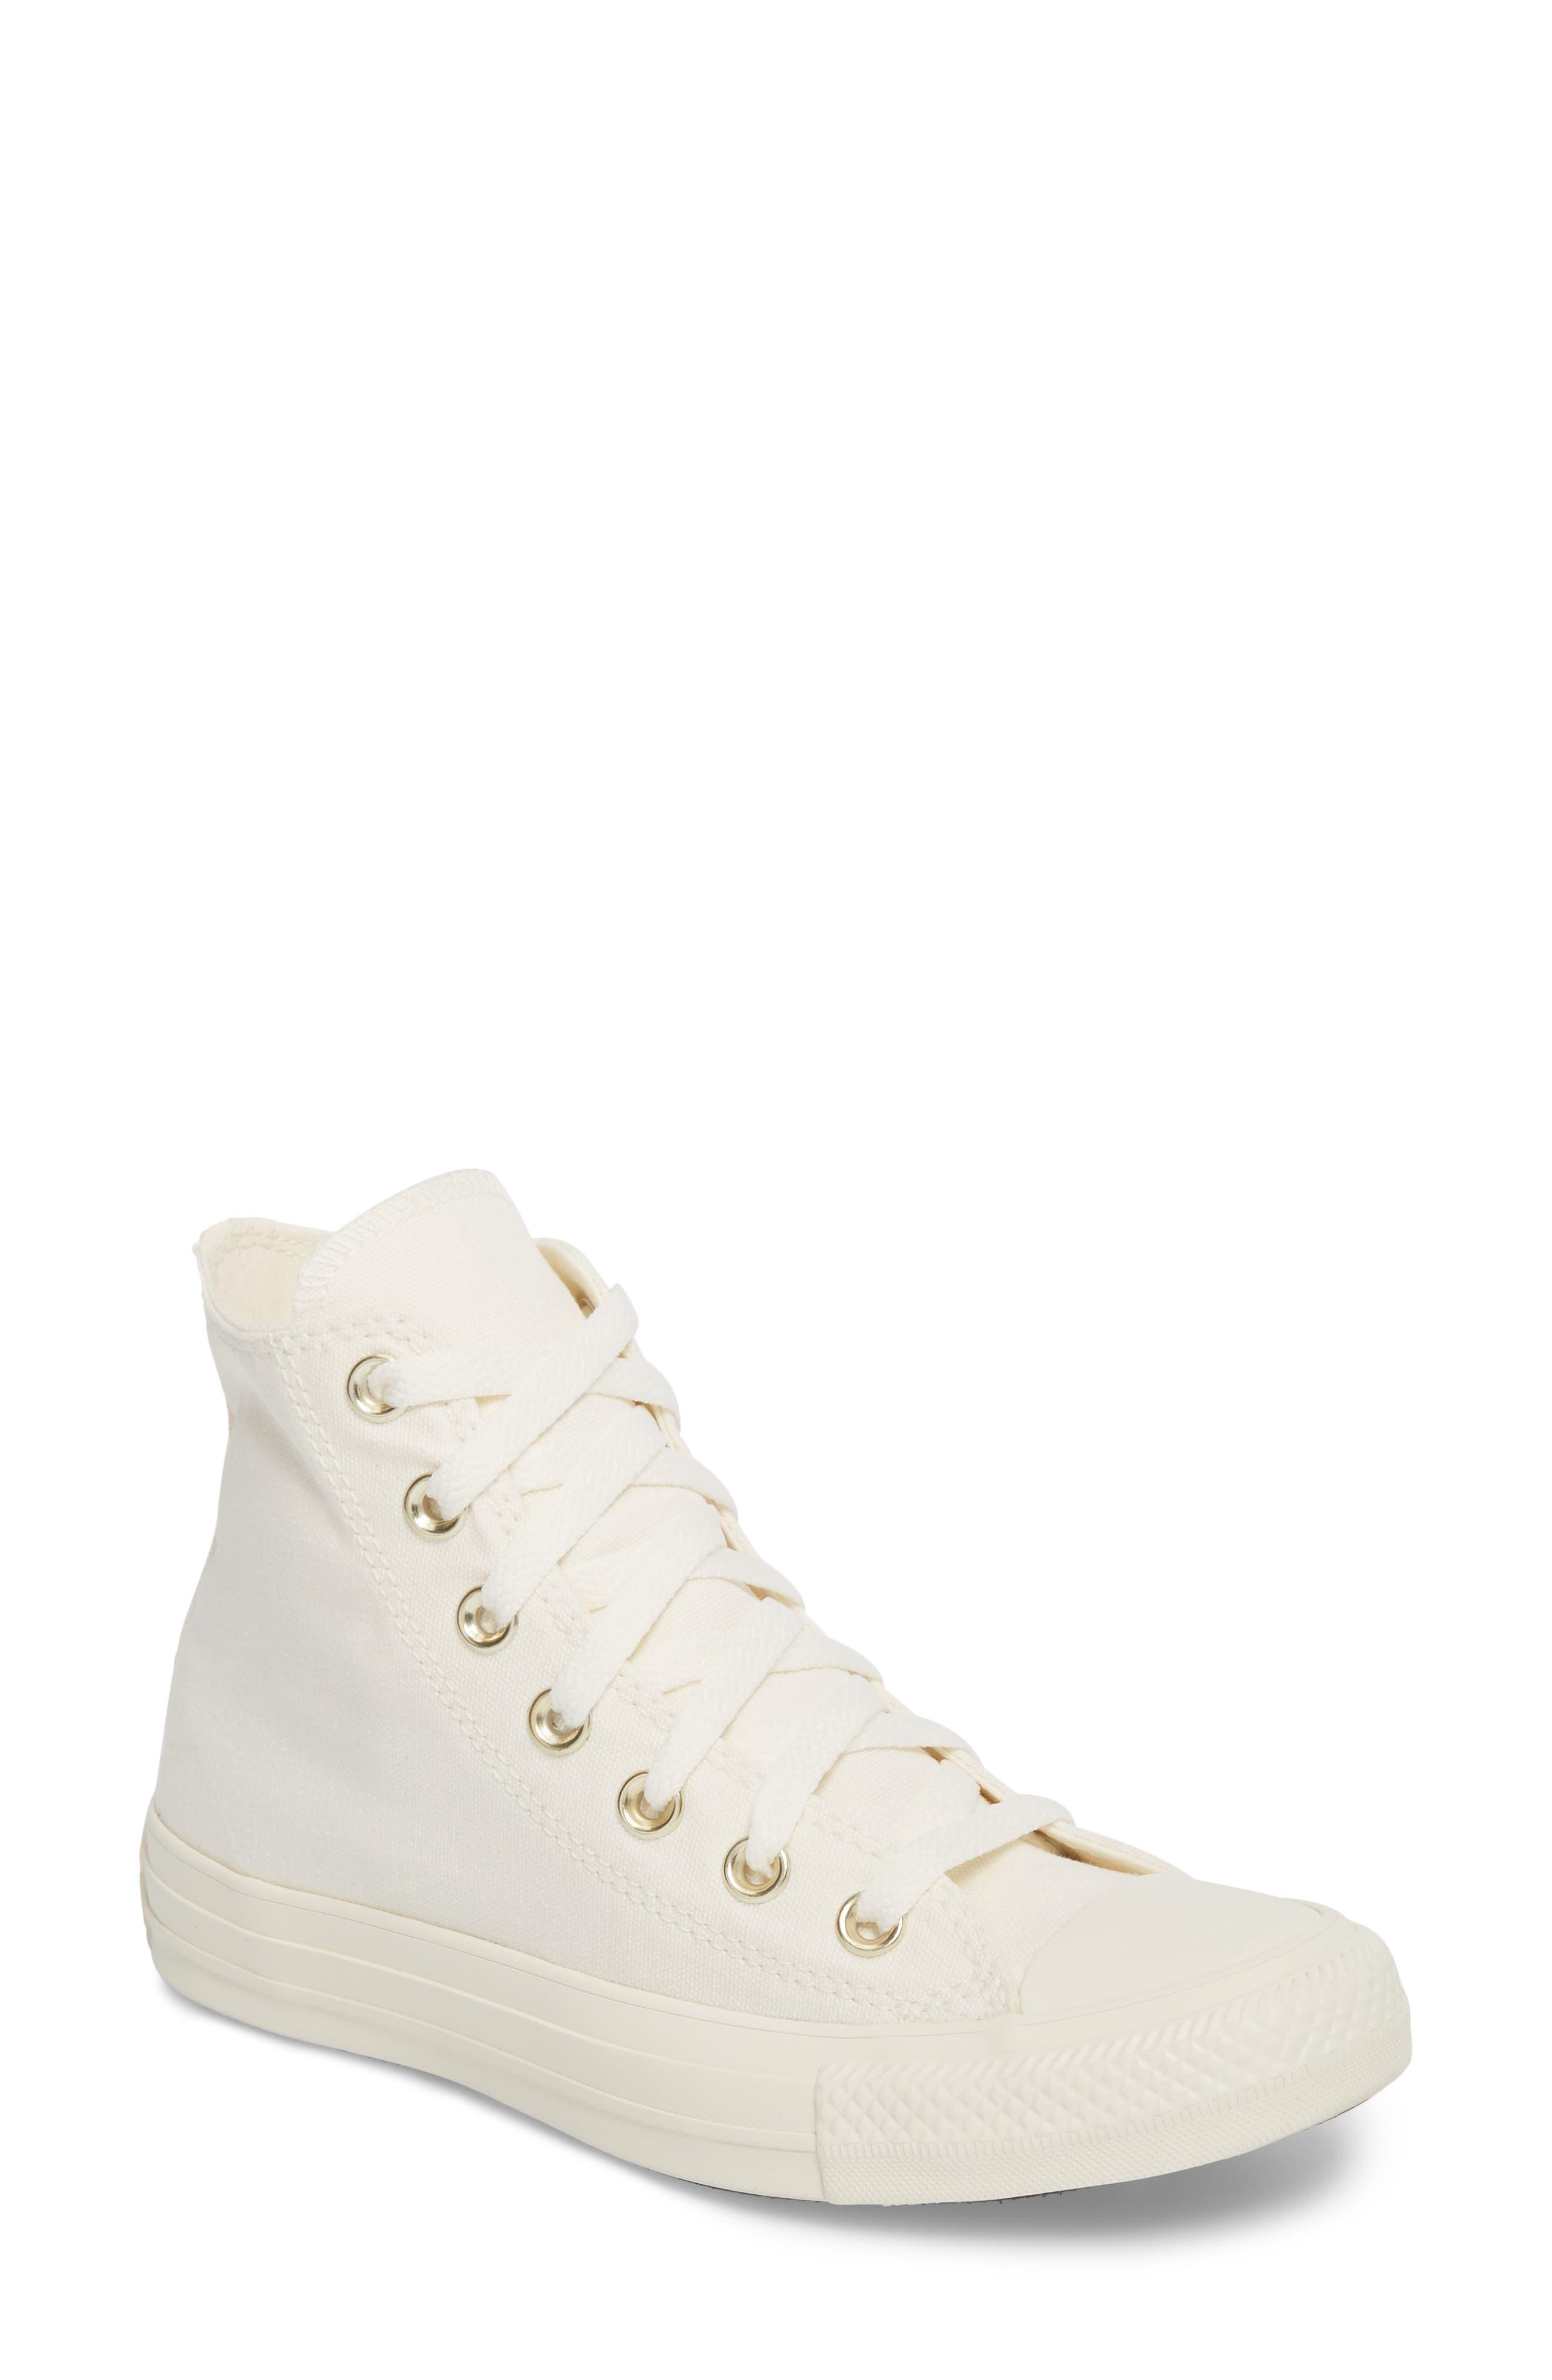 Alternate Image 1 Selected - Converse Chuck Taylor® All Star® Hi Sneaker (Women)